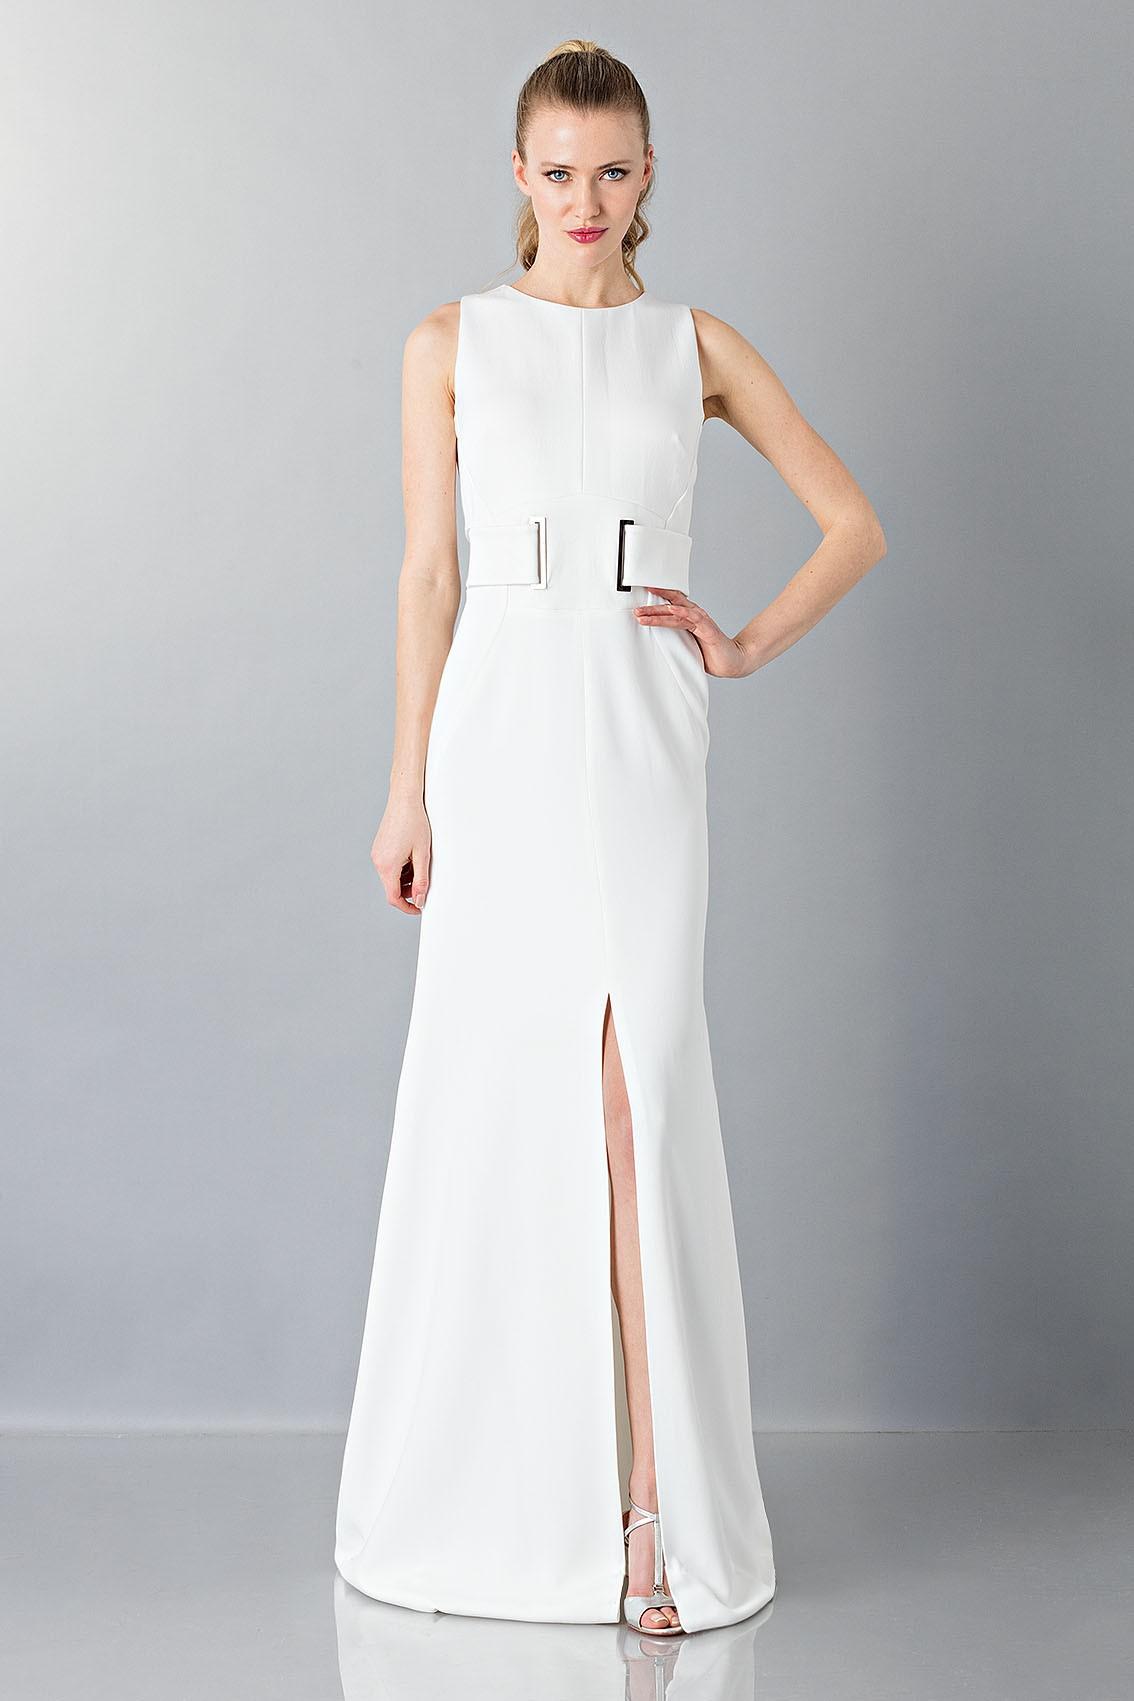 Drexcode - Antonio Berardi Wedding dress   Rent luxury dress